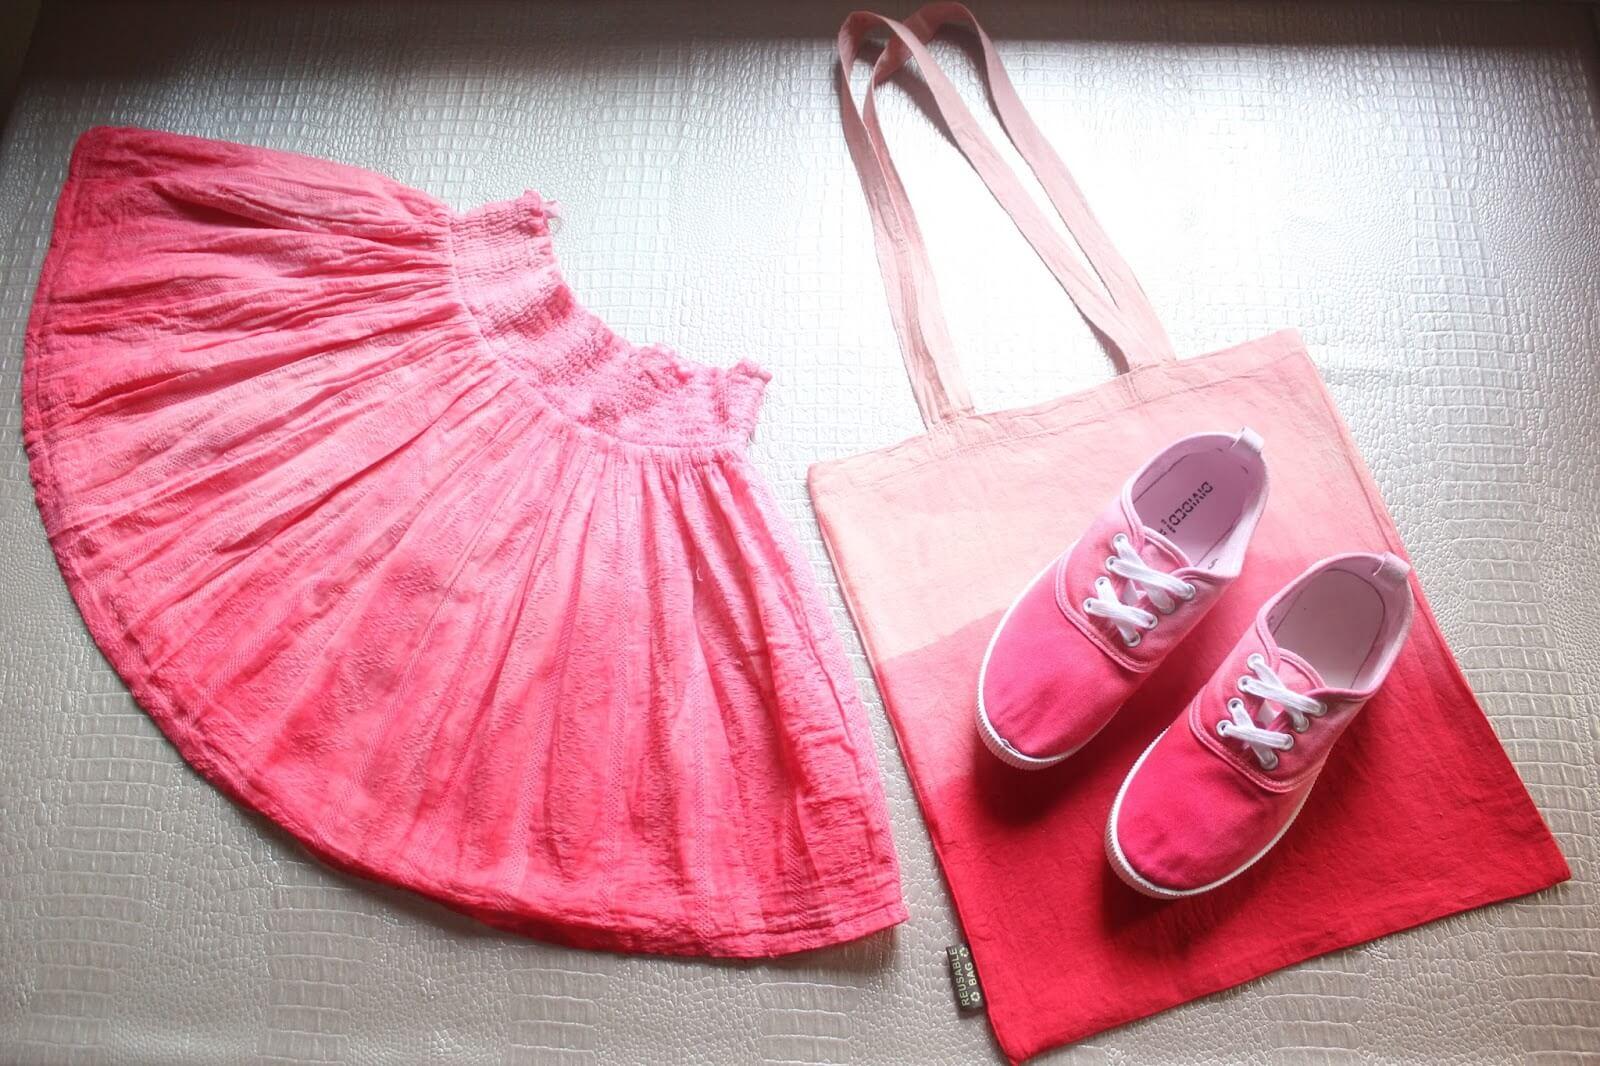 Teñir ropa de un mismo color.